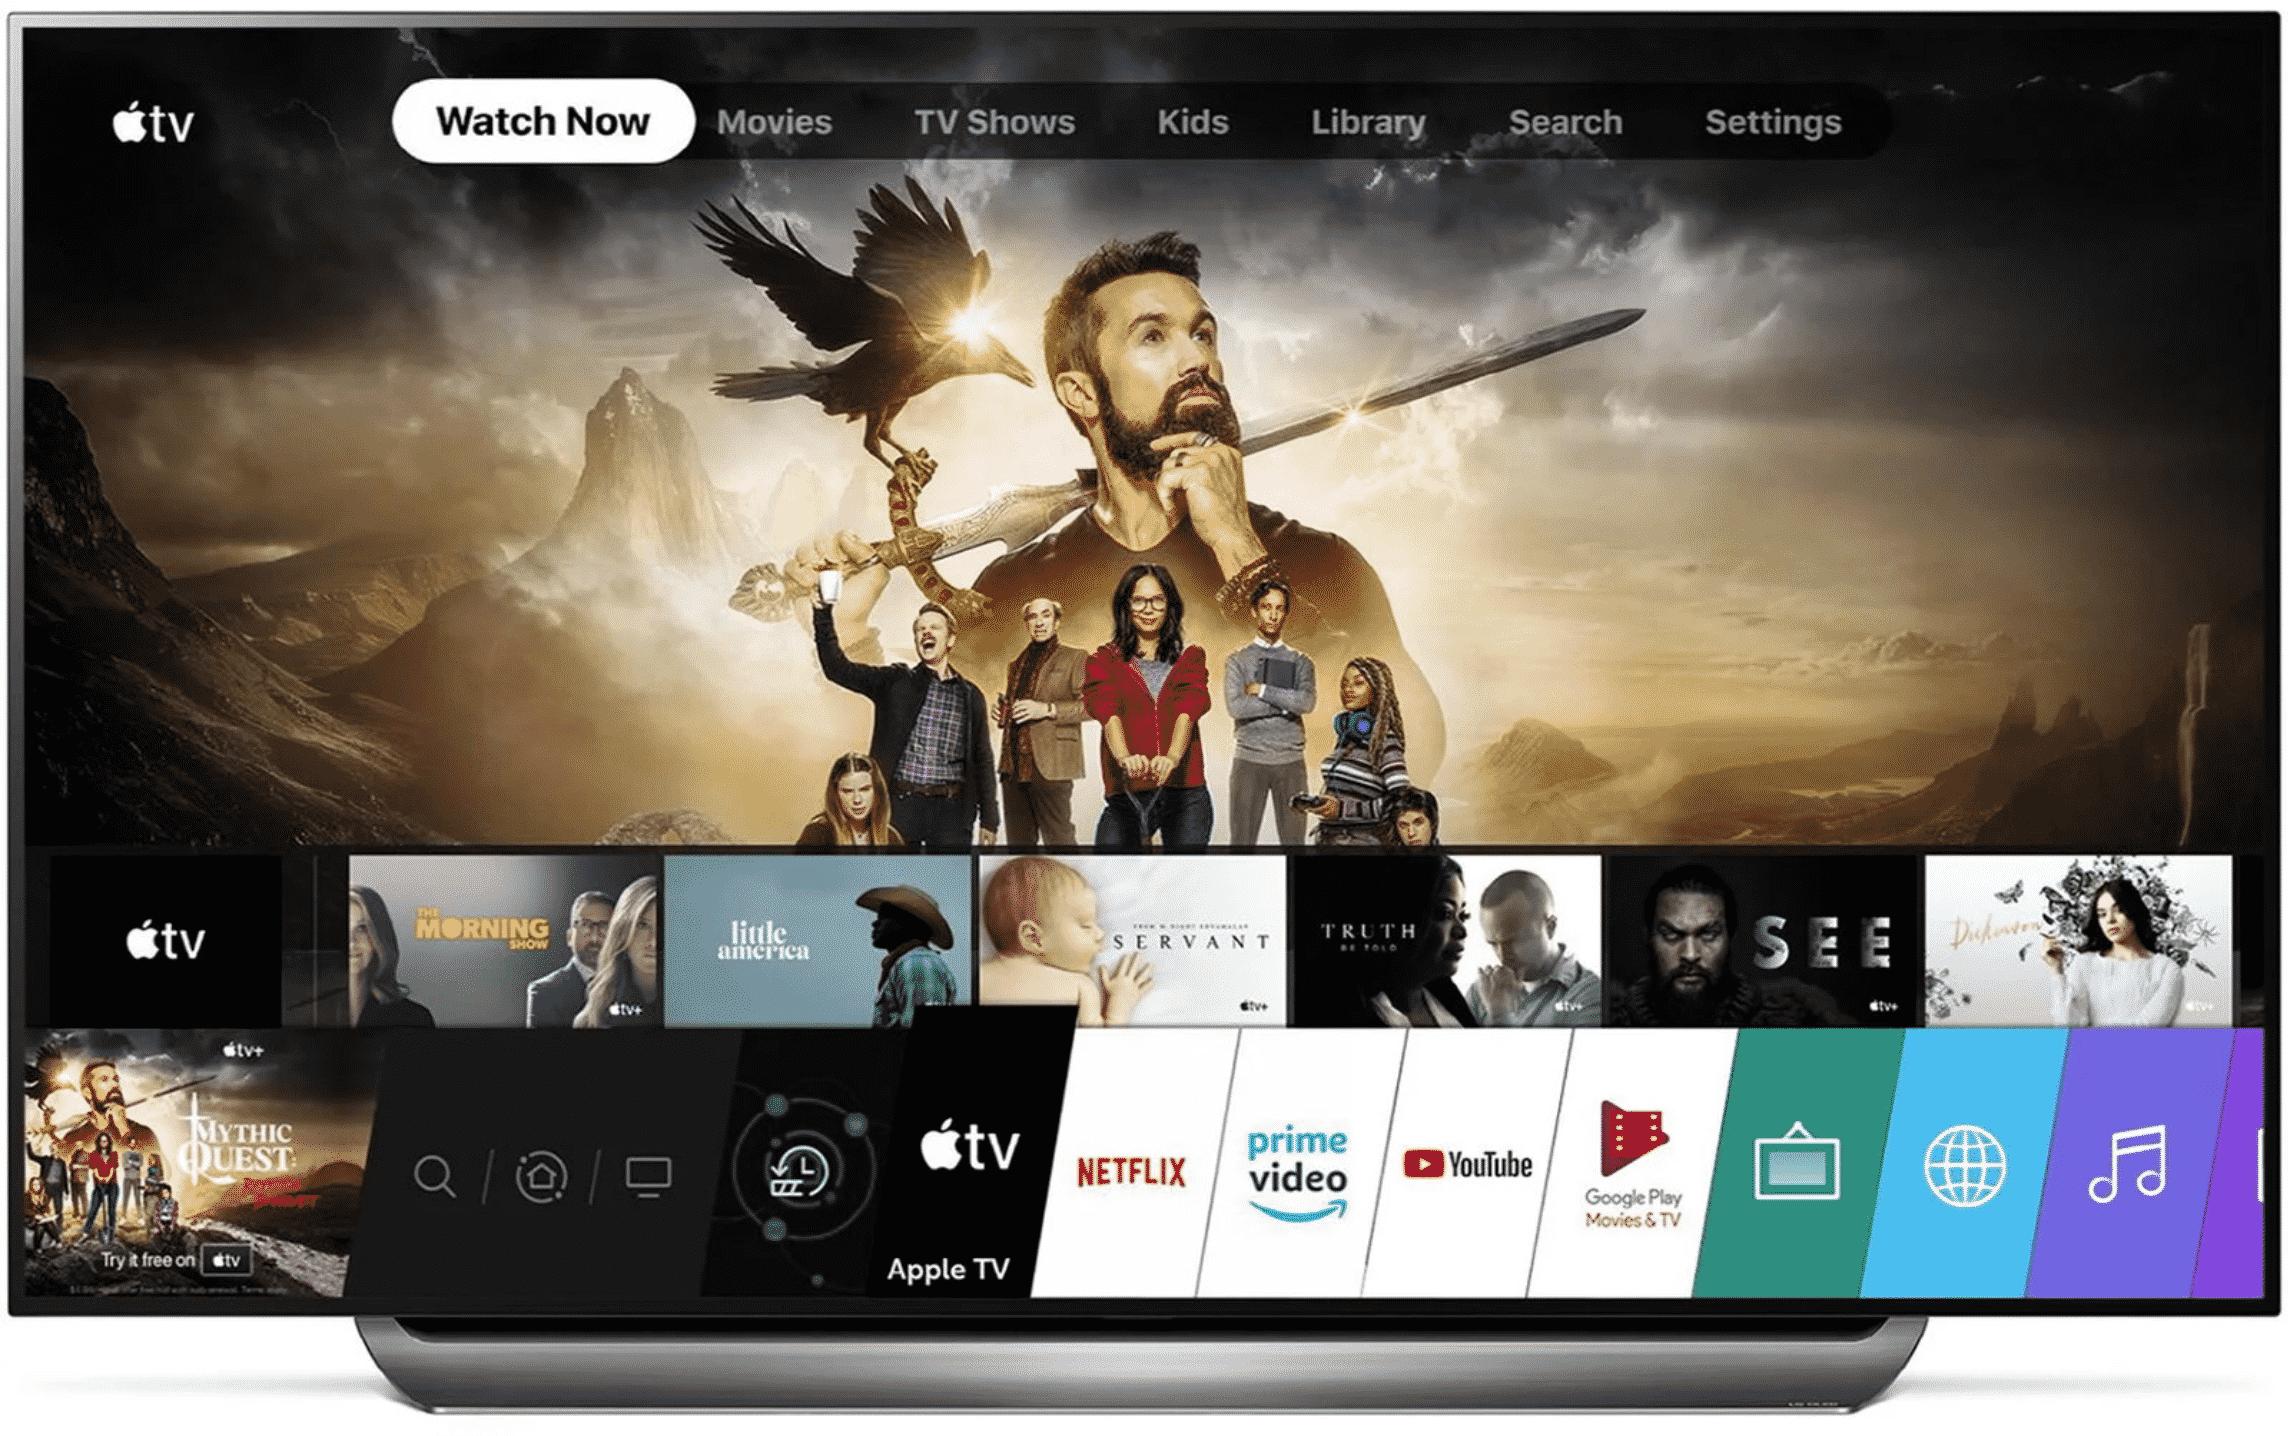 Apple TV App Appears on Select LG TVs